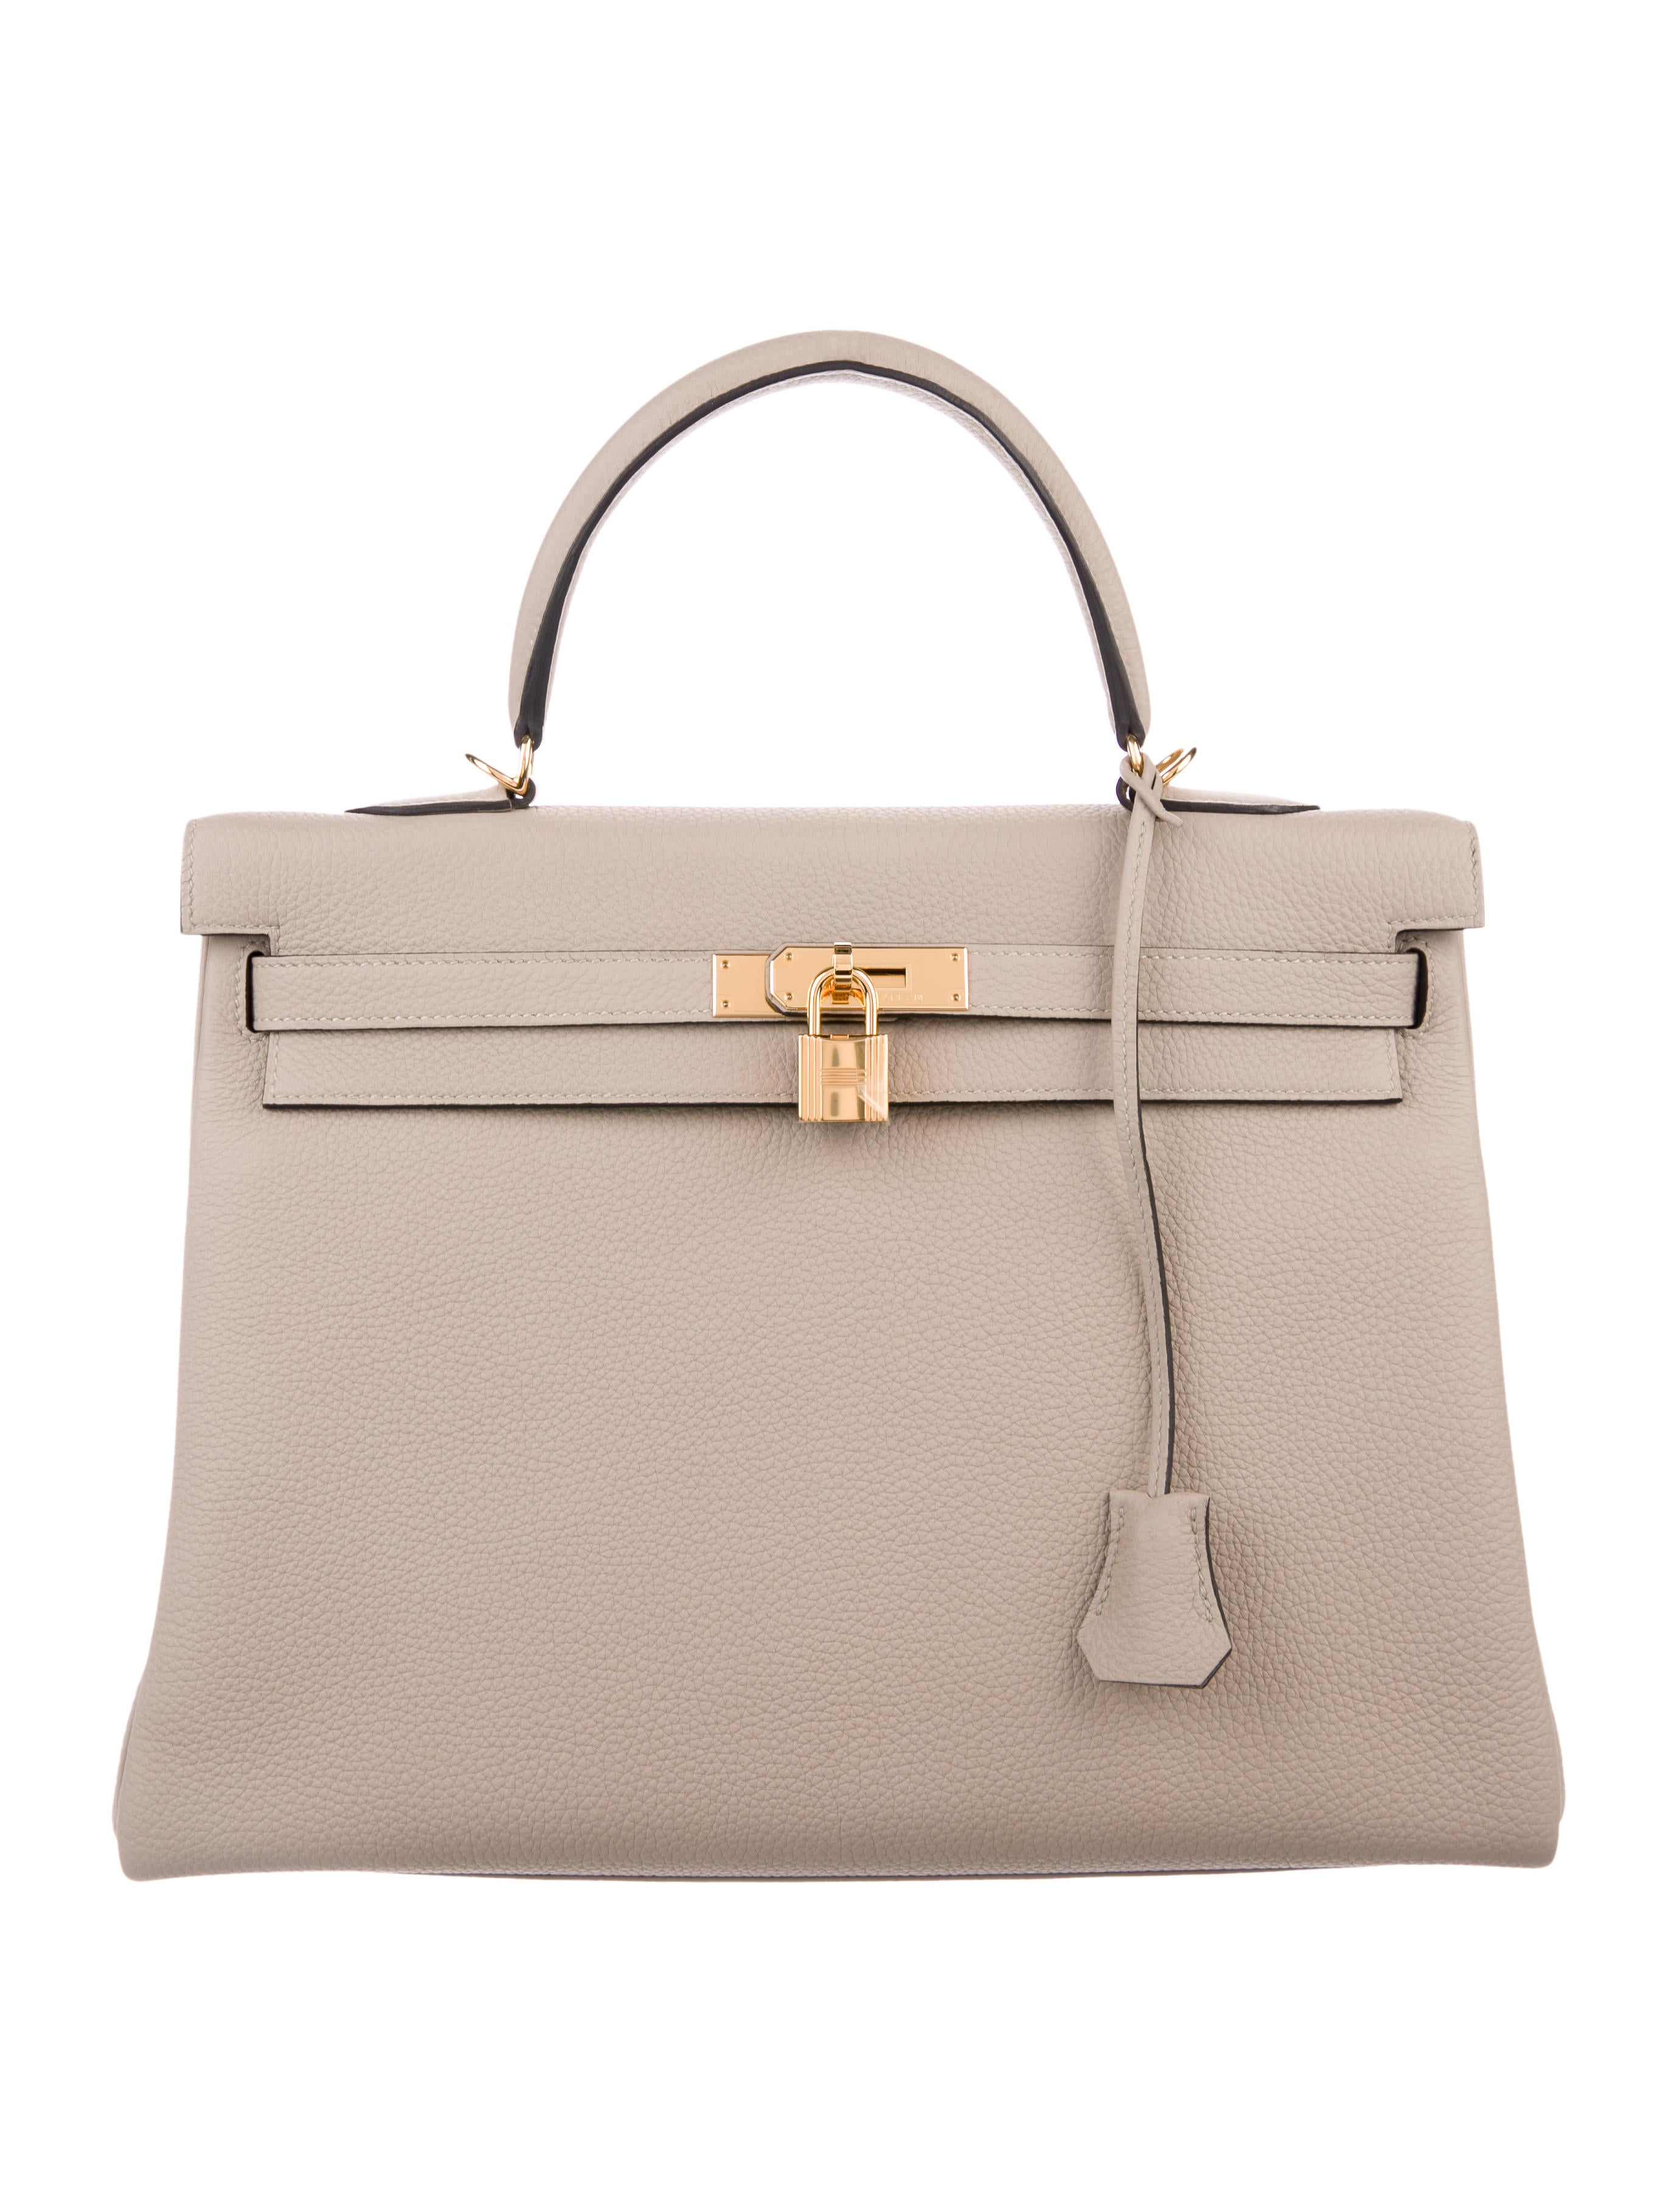 0e7a2f42e69a Hermès Kelly Bag